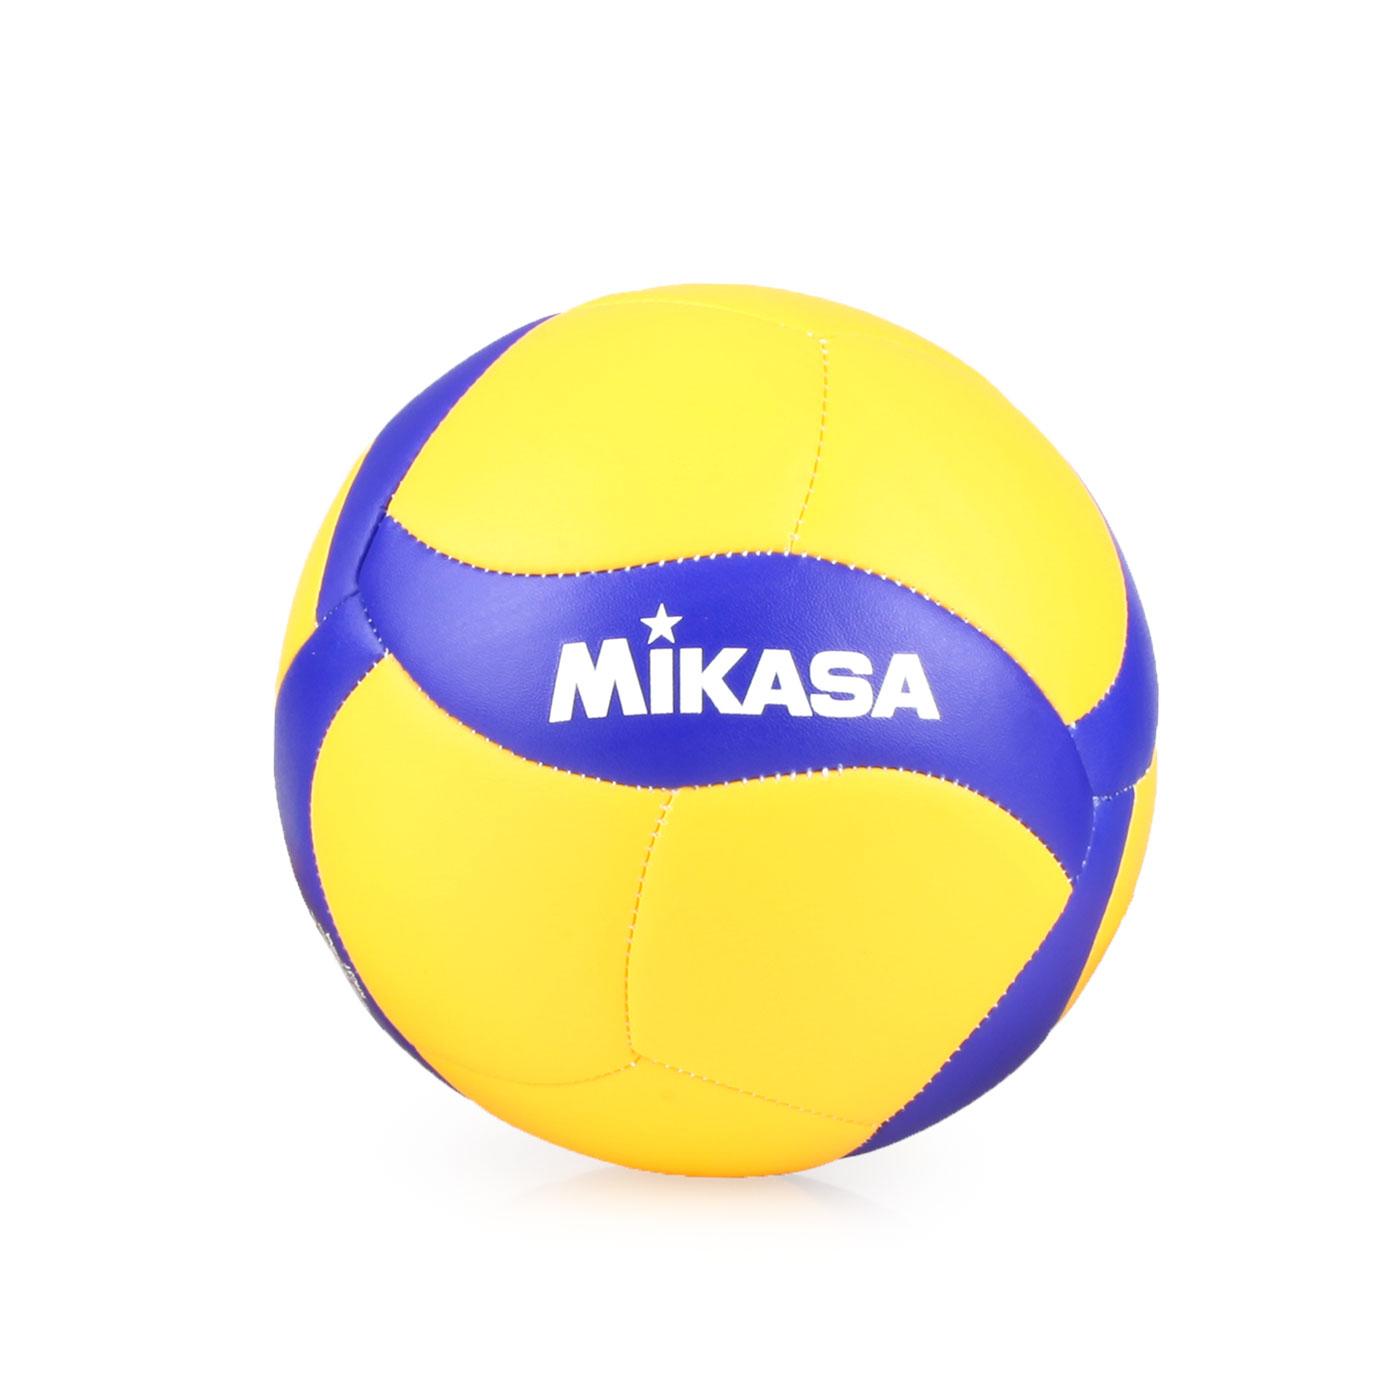 MIKASA 紀念排球#1.5 MKV15W - 黃藍